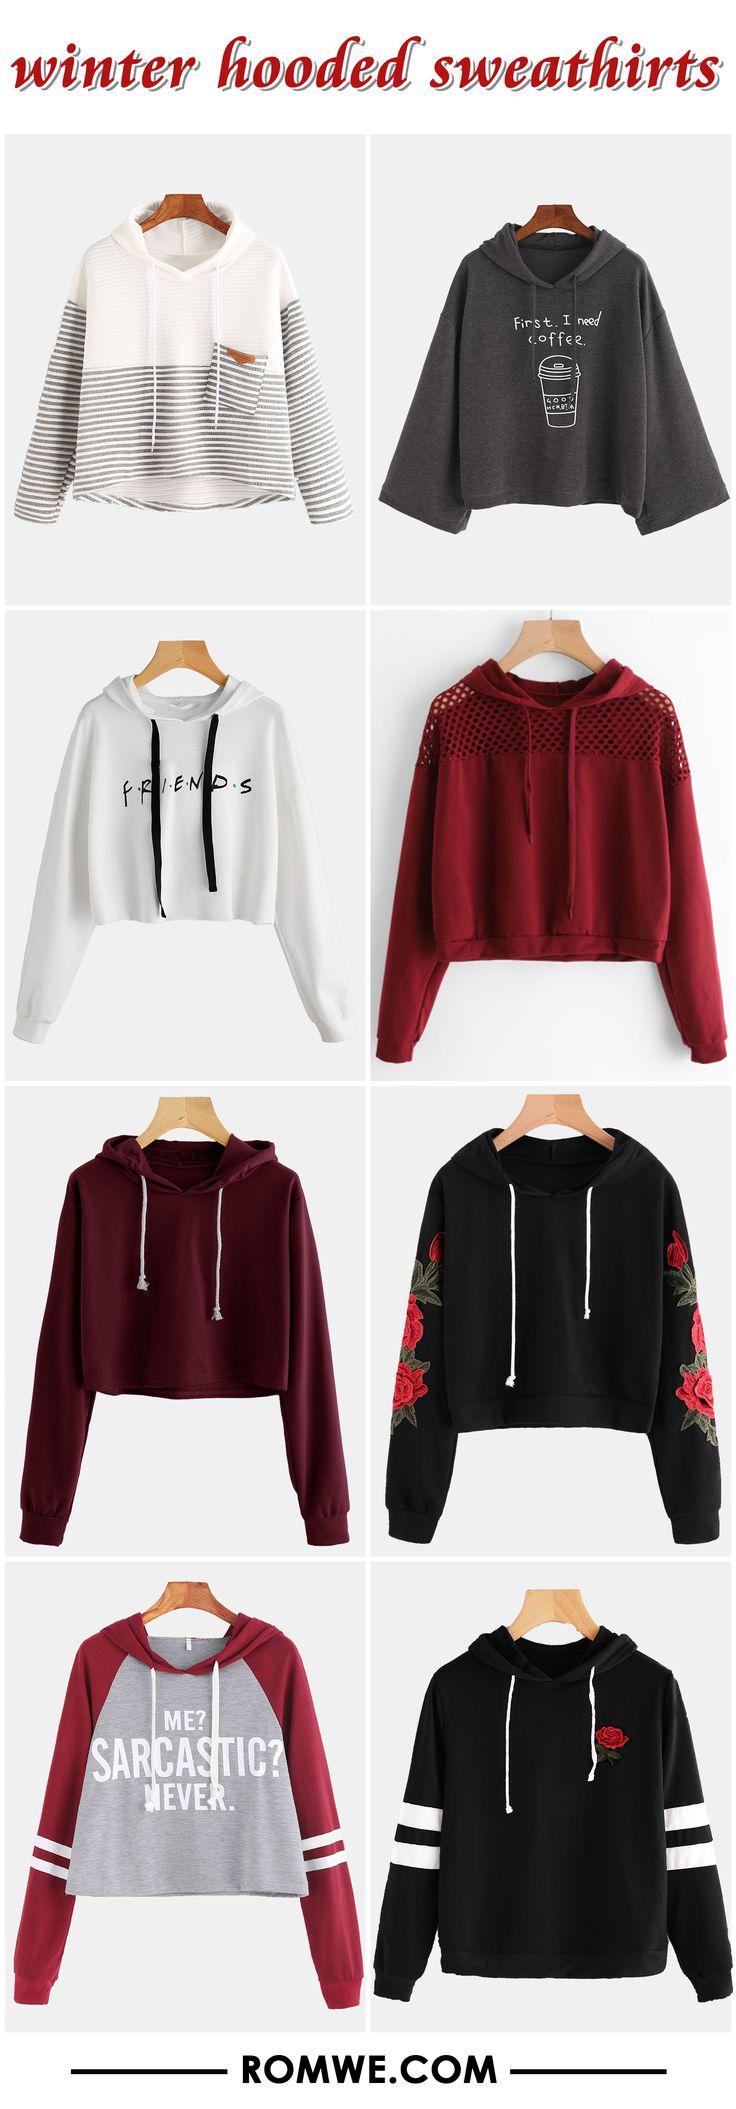 winter hooded sweatshirts - romwe.com